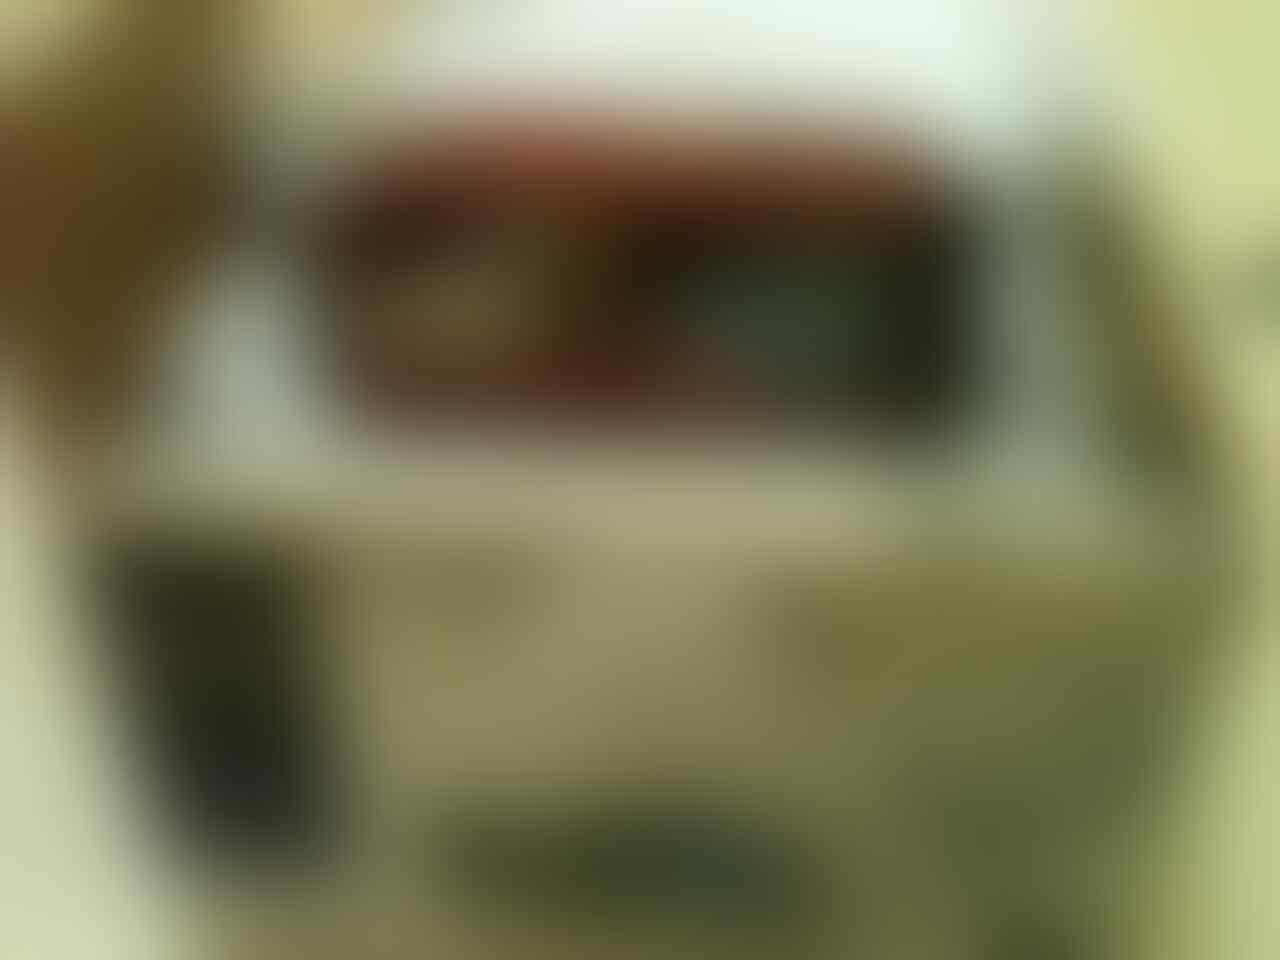 WTS handycam sony sx 65 e + memory 4gb LIKE NEW